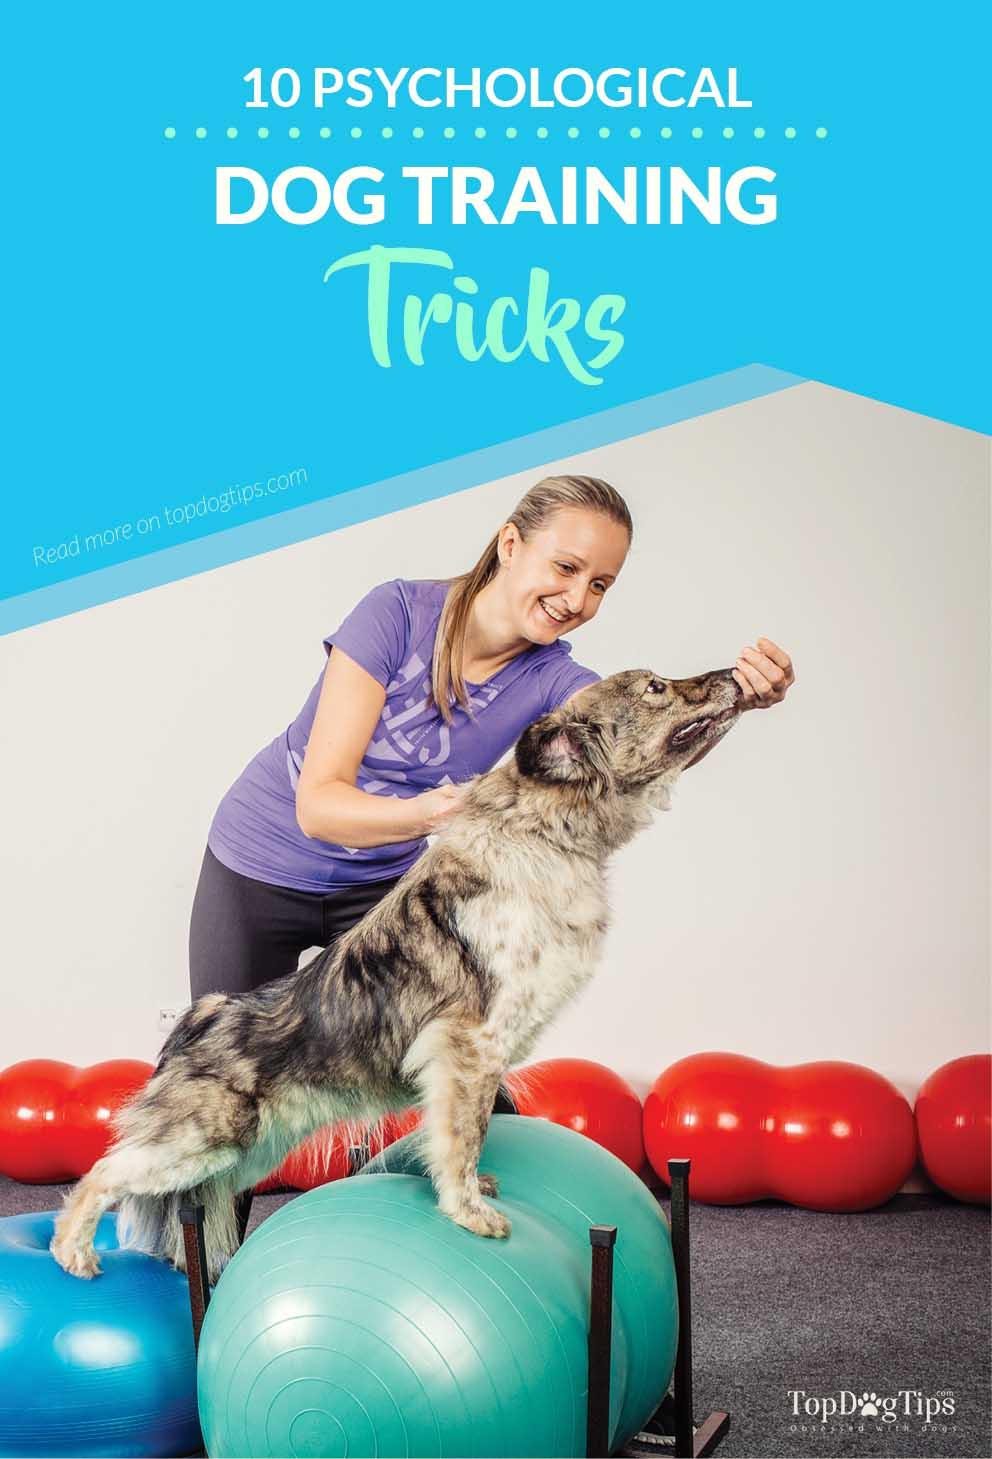 Psychological Dog Training Tricks